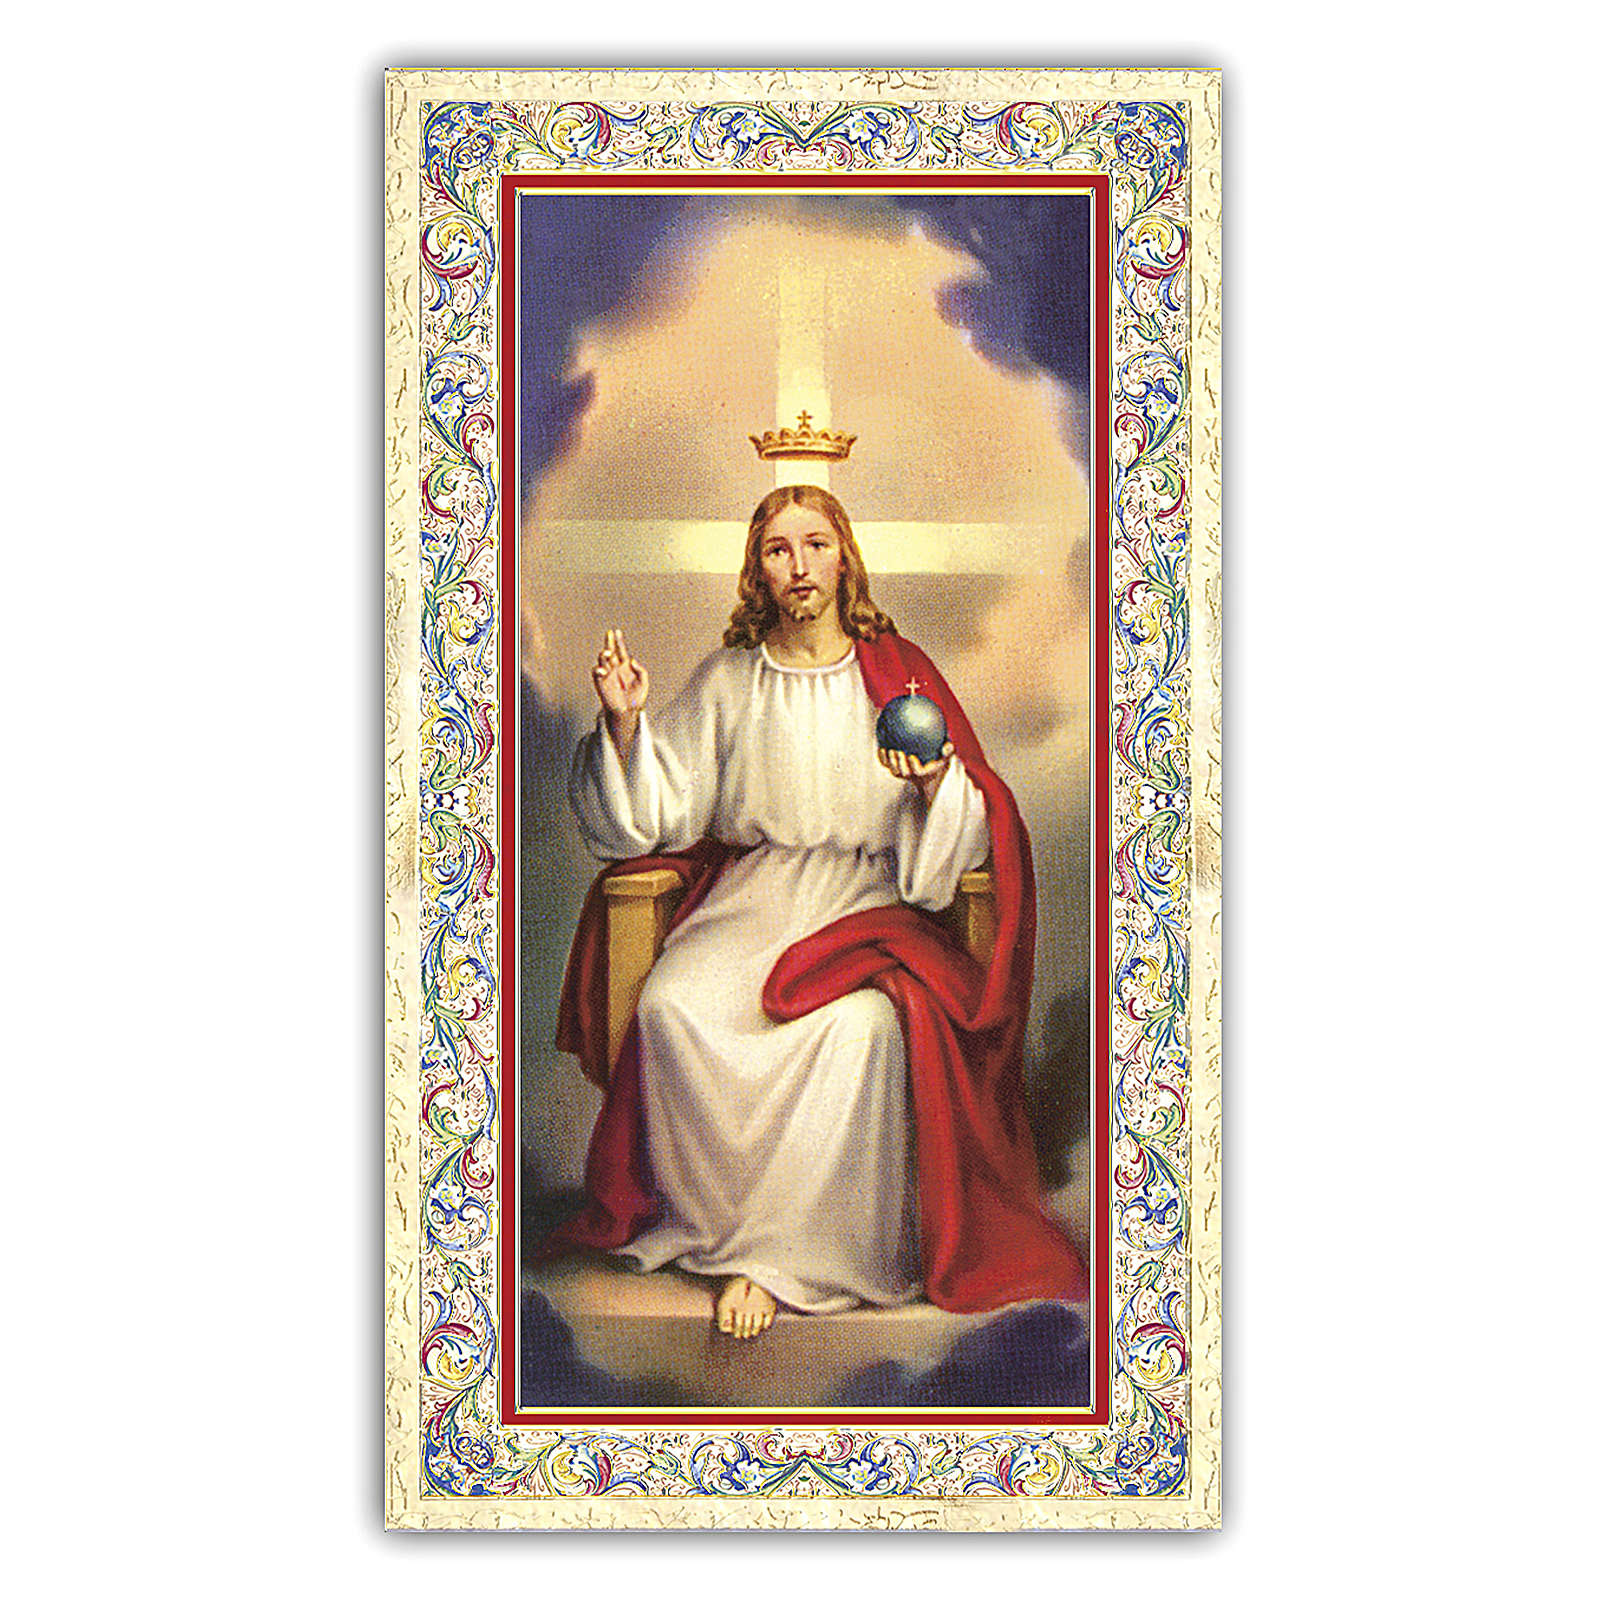 Santino Gesù in trono 10x5 cm ITA 4